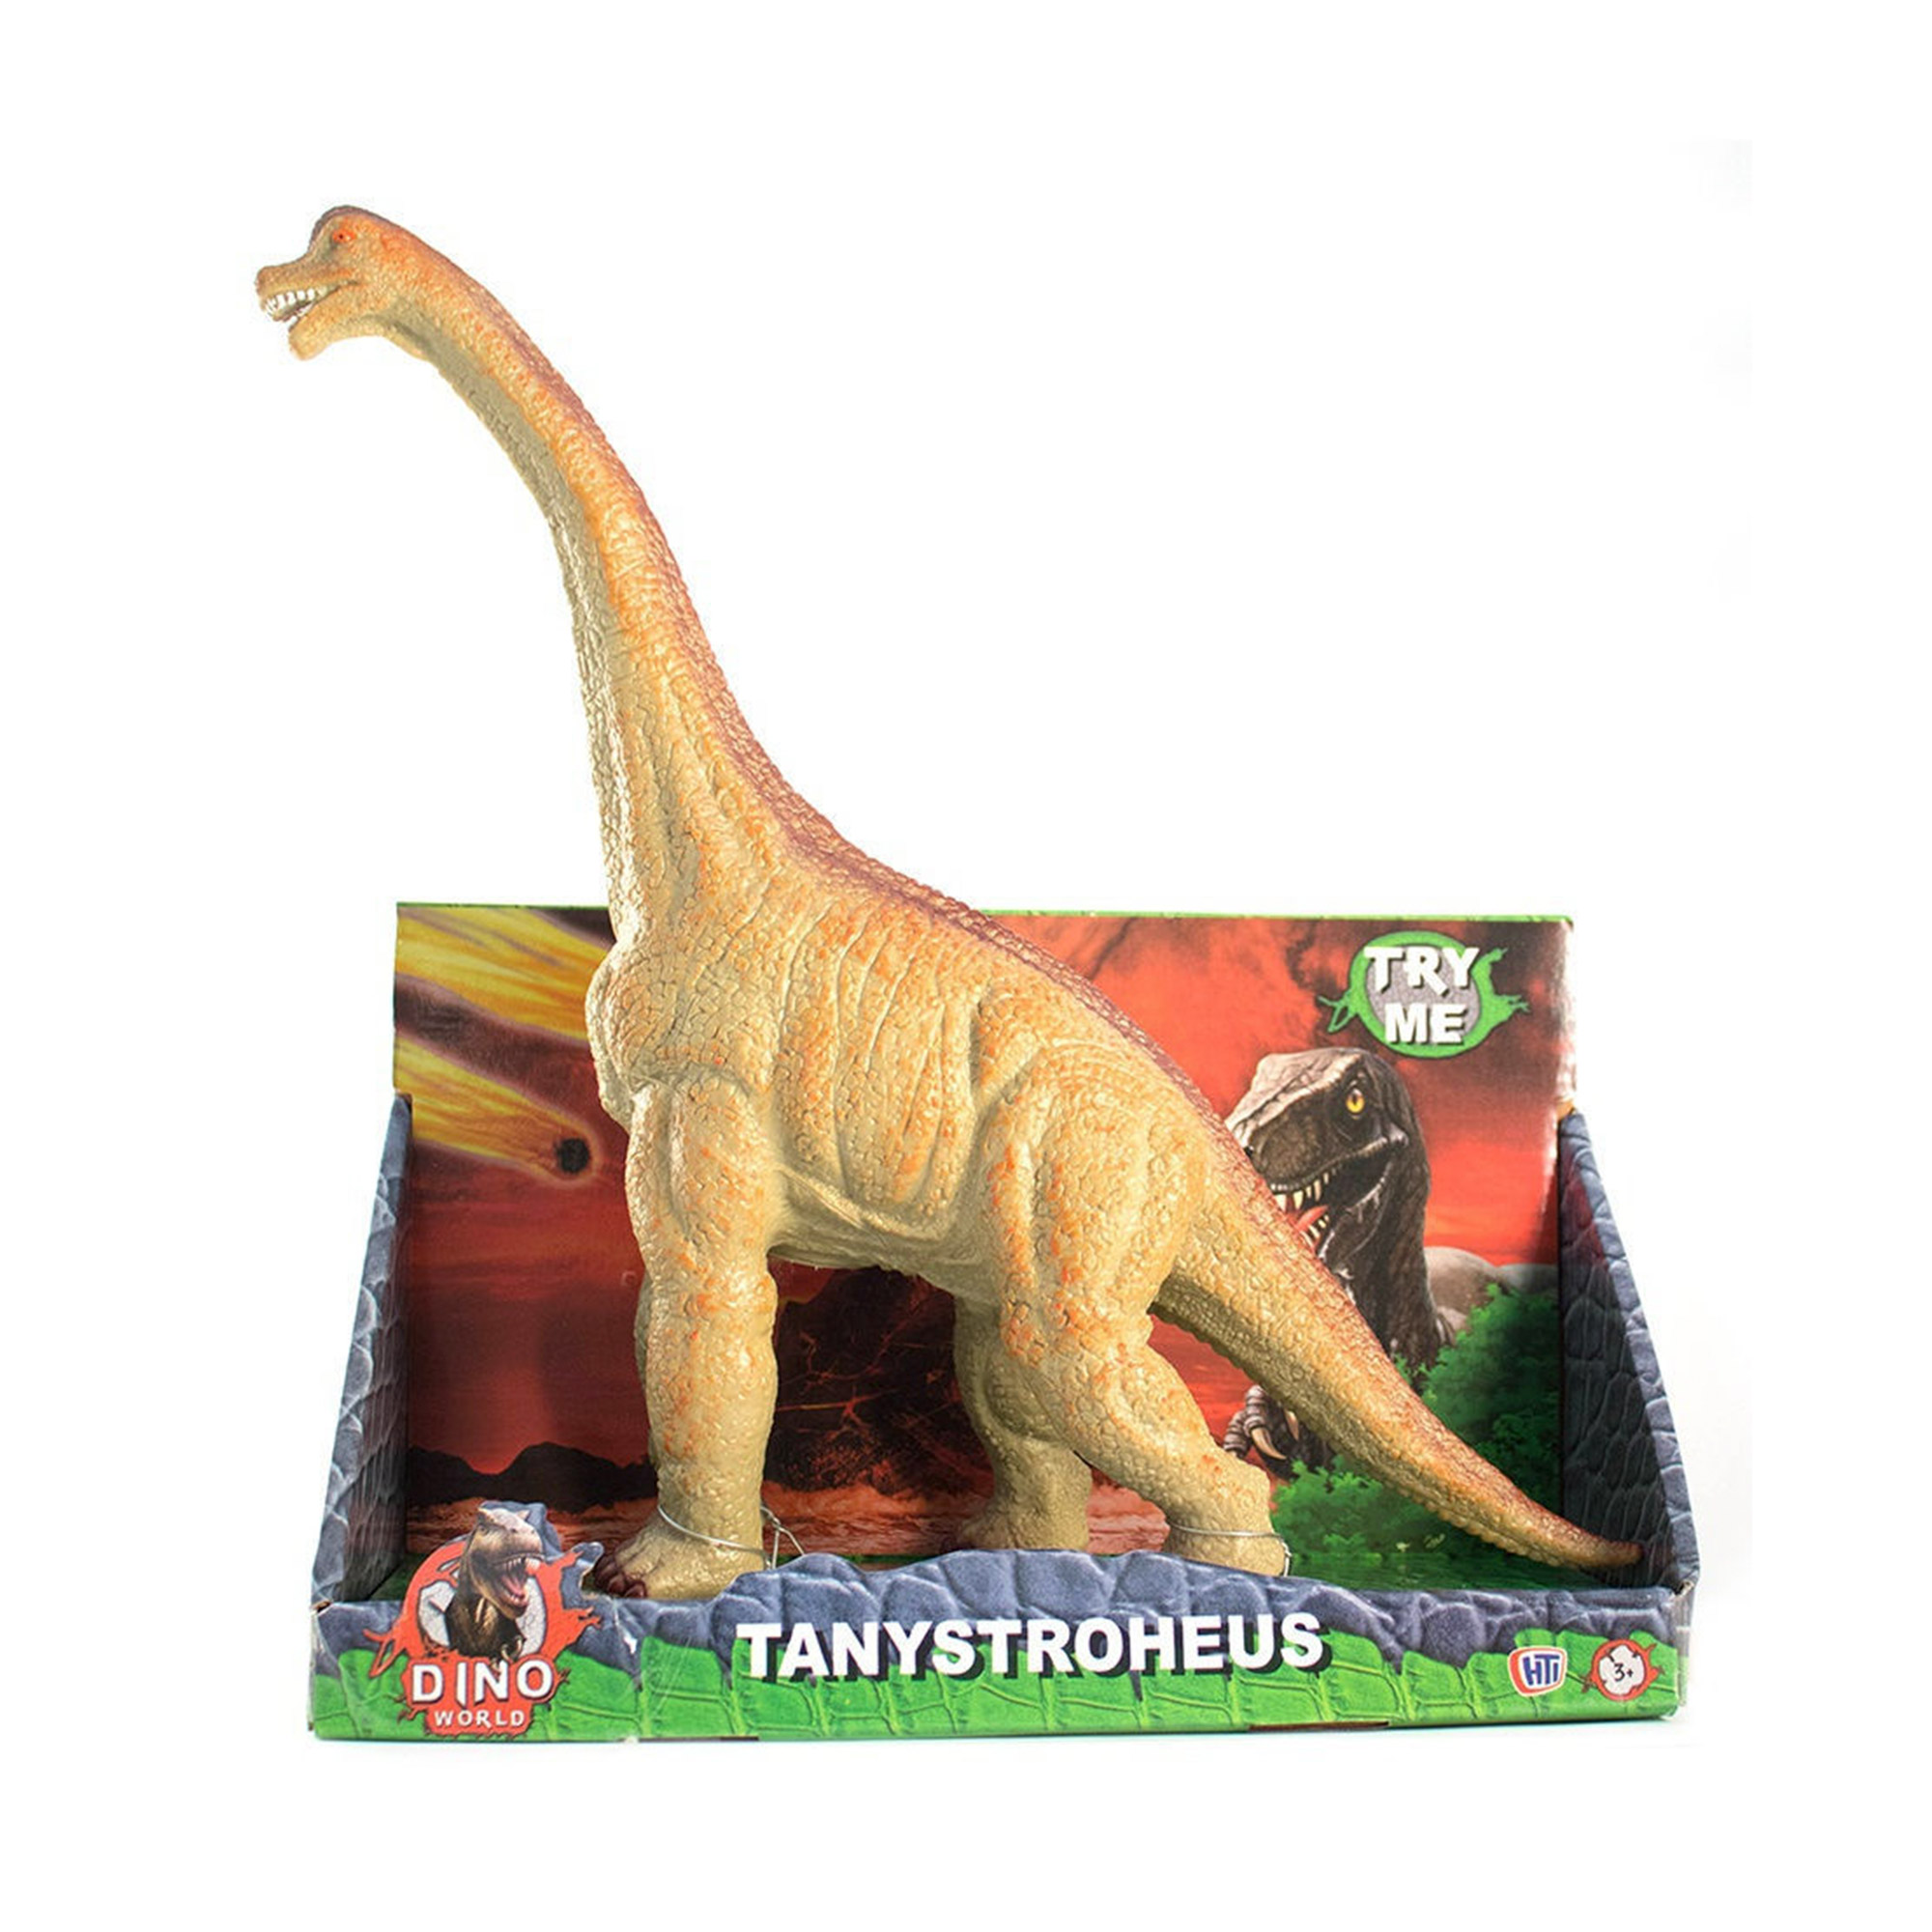 Фигурка динозавра HTI DINO WORLD Танистрофей 42 см фигурка hti dino world аллозавр 1374171 unib